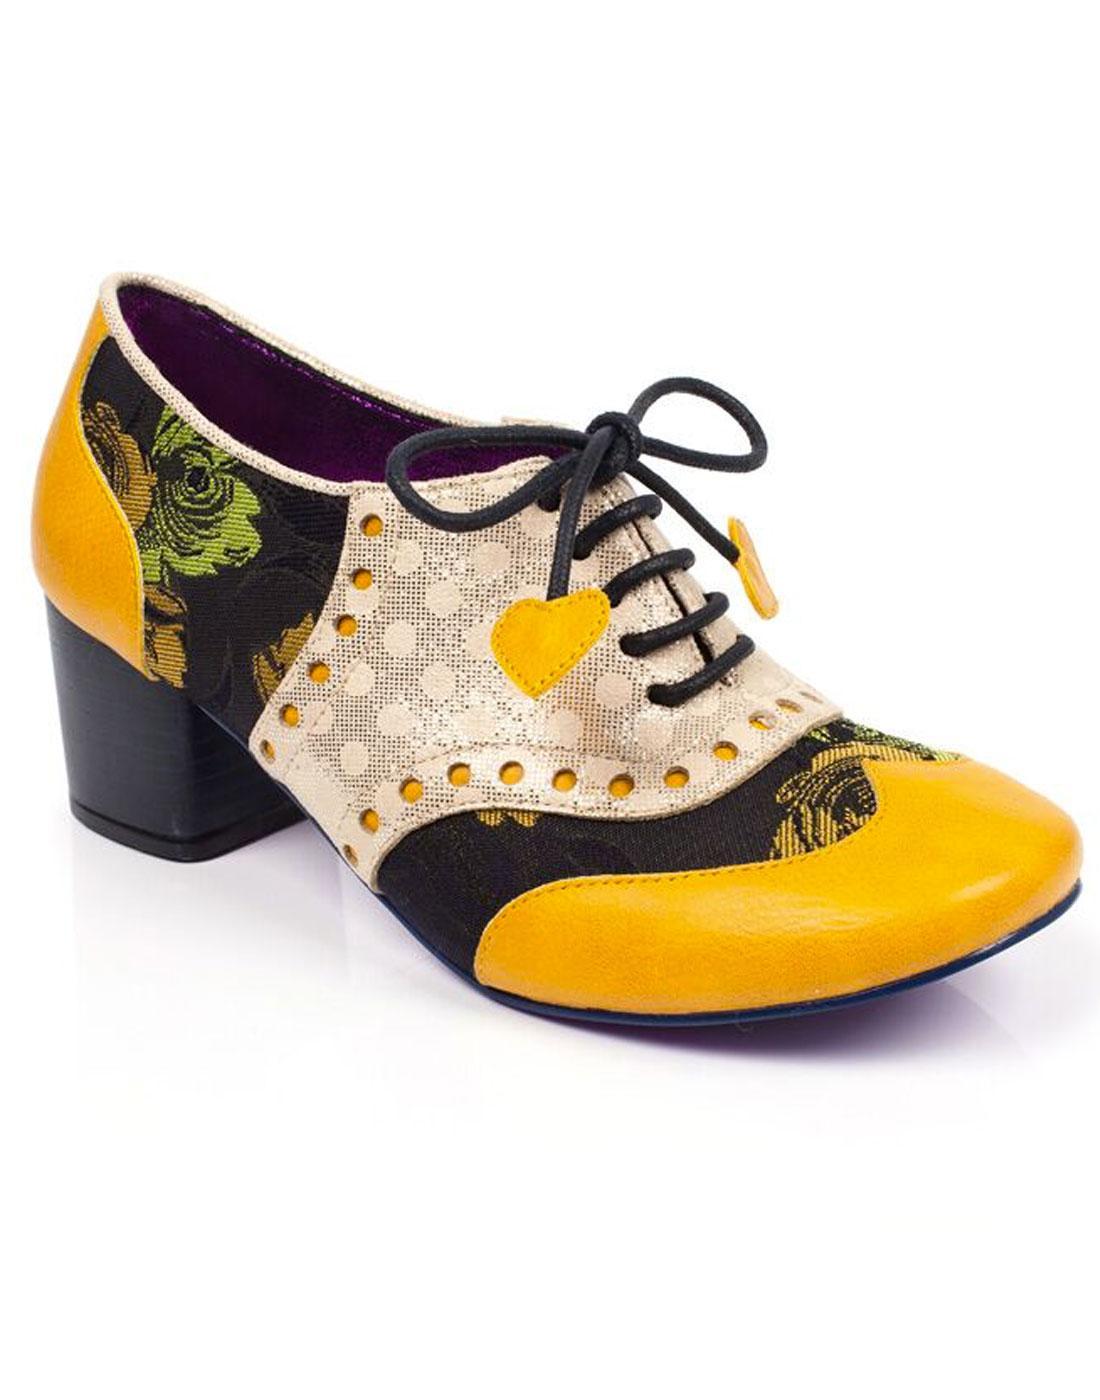 Clara Bow POETIC LICENCE Retro 50s Floral Heels M